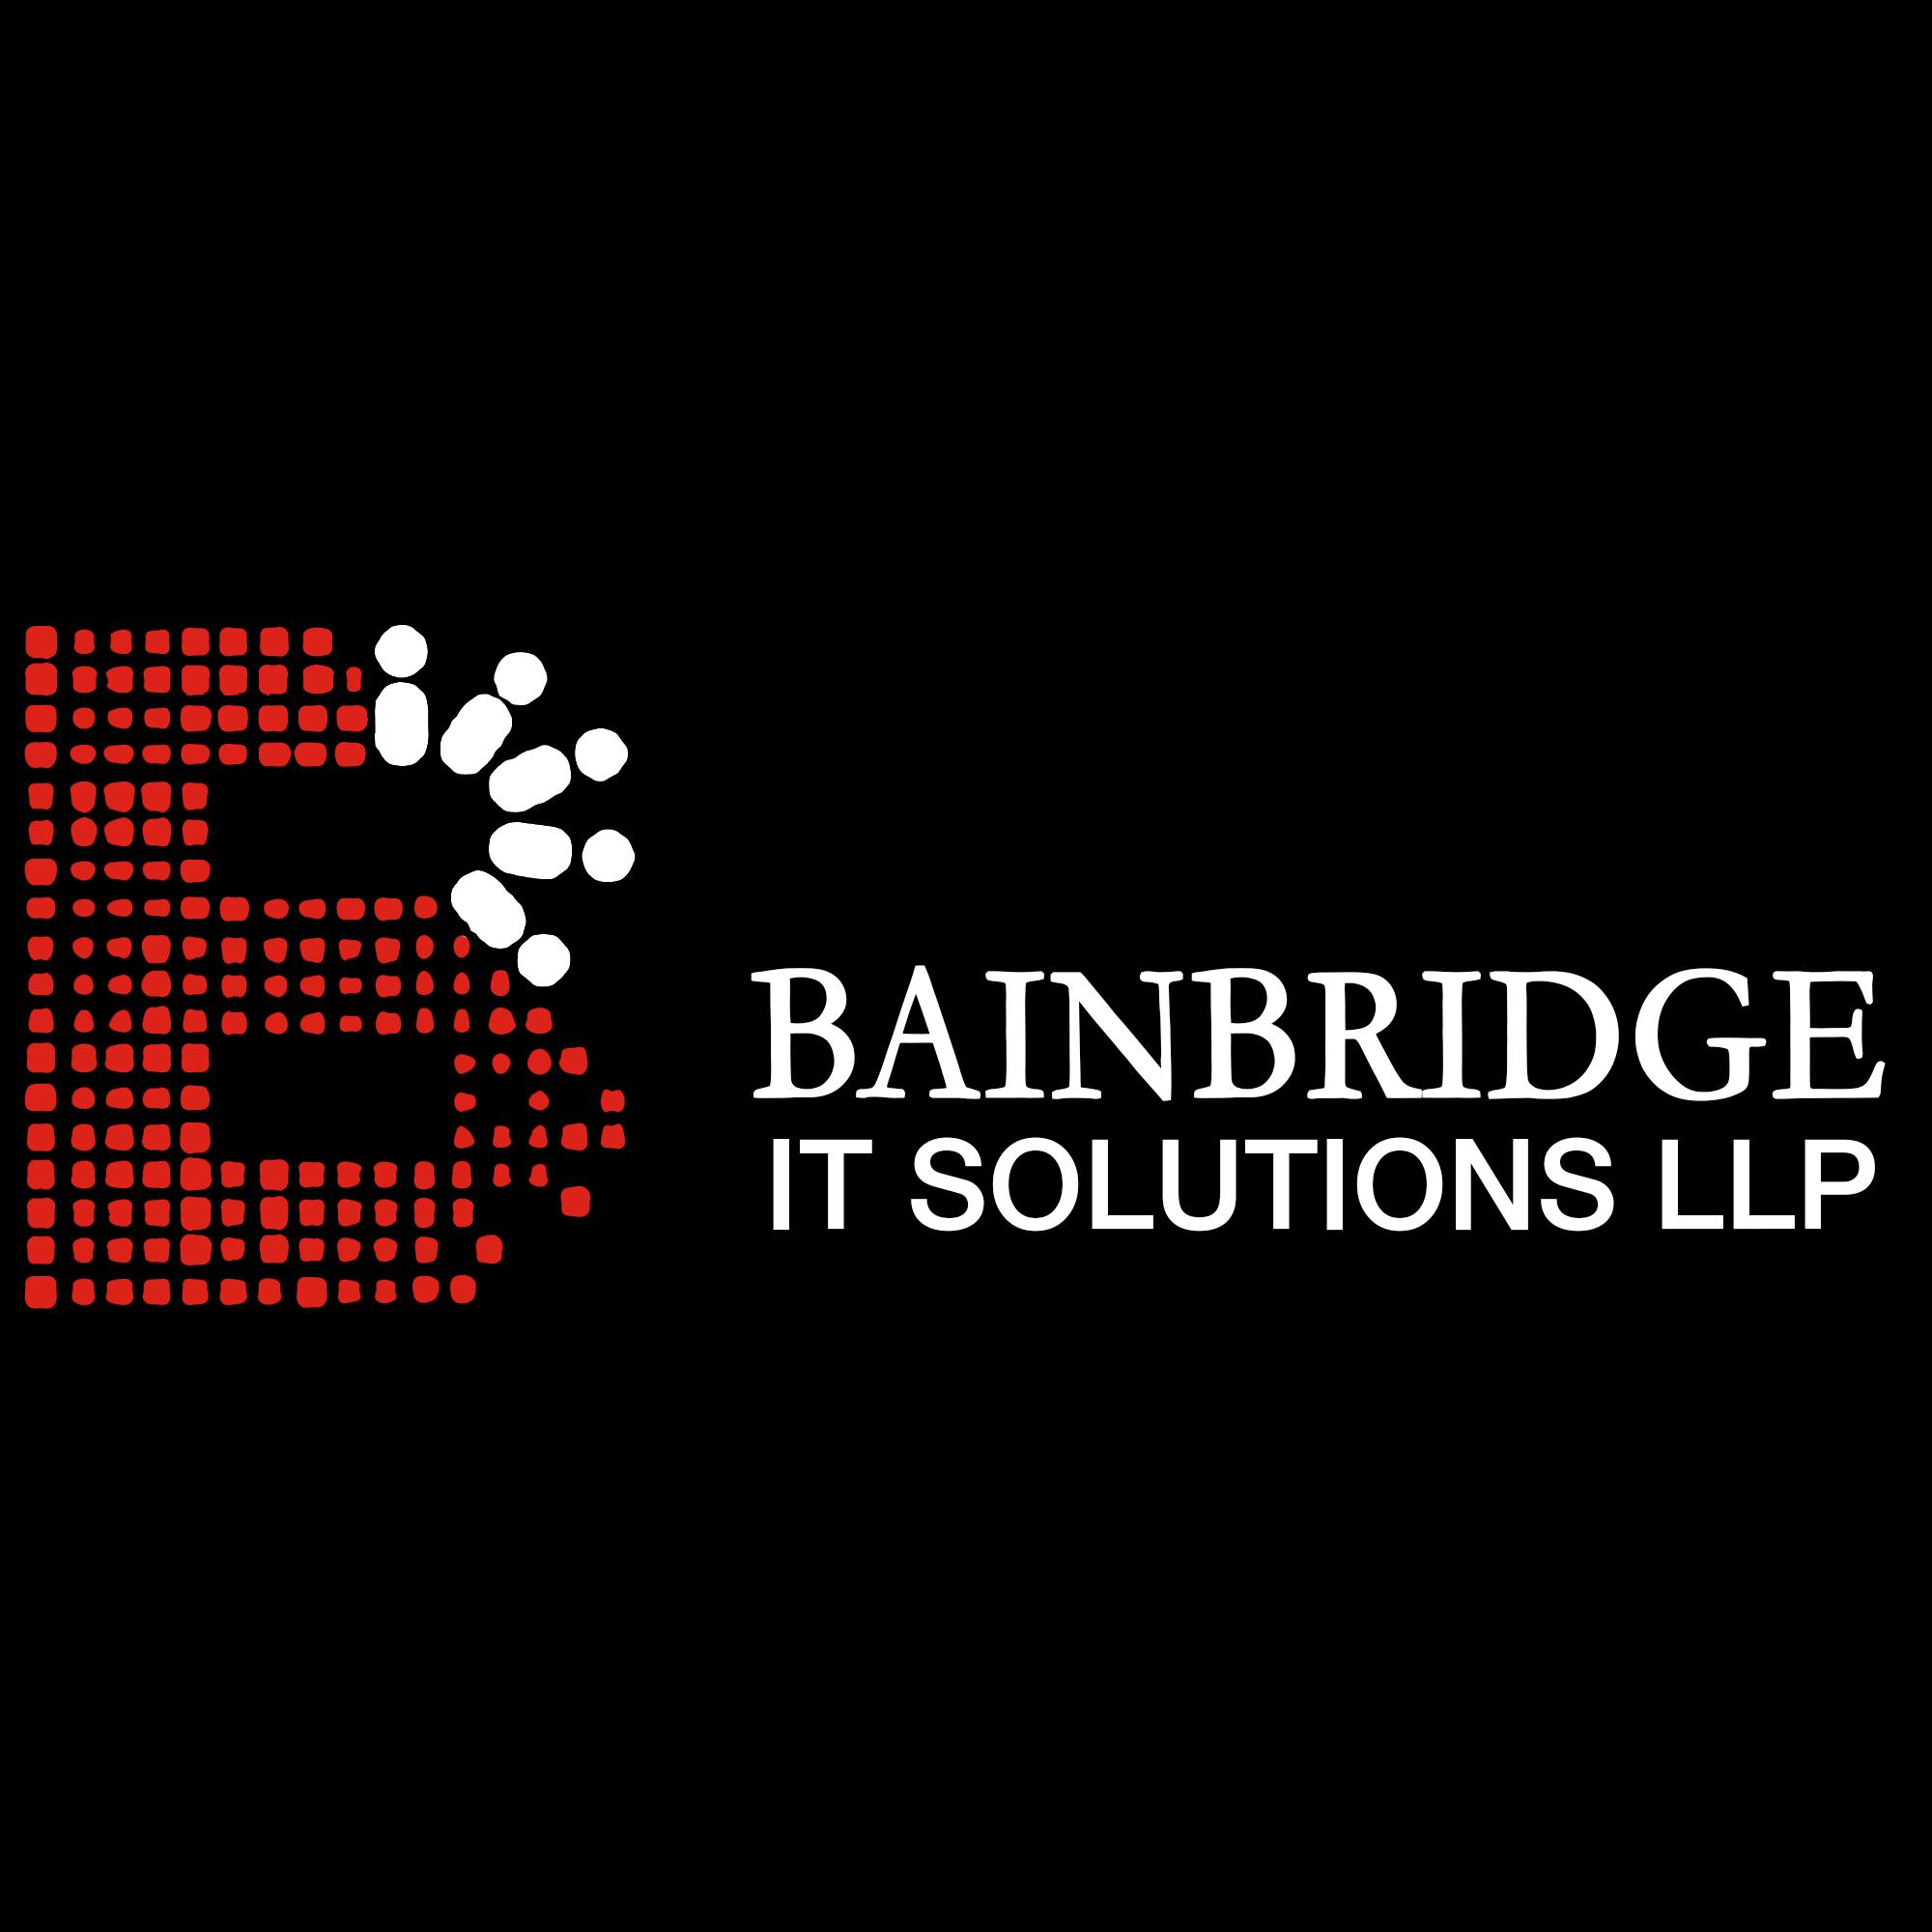 BainBridge IT Solutions LLP